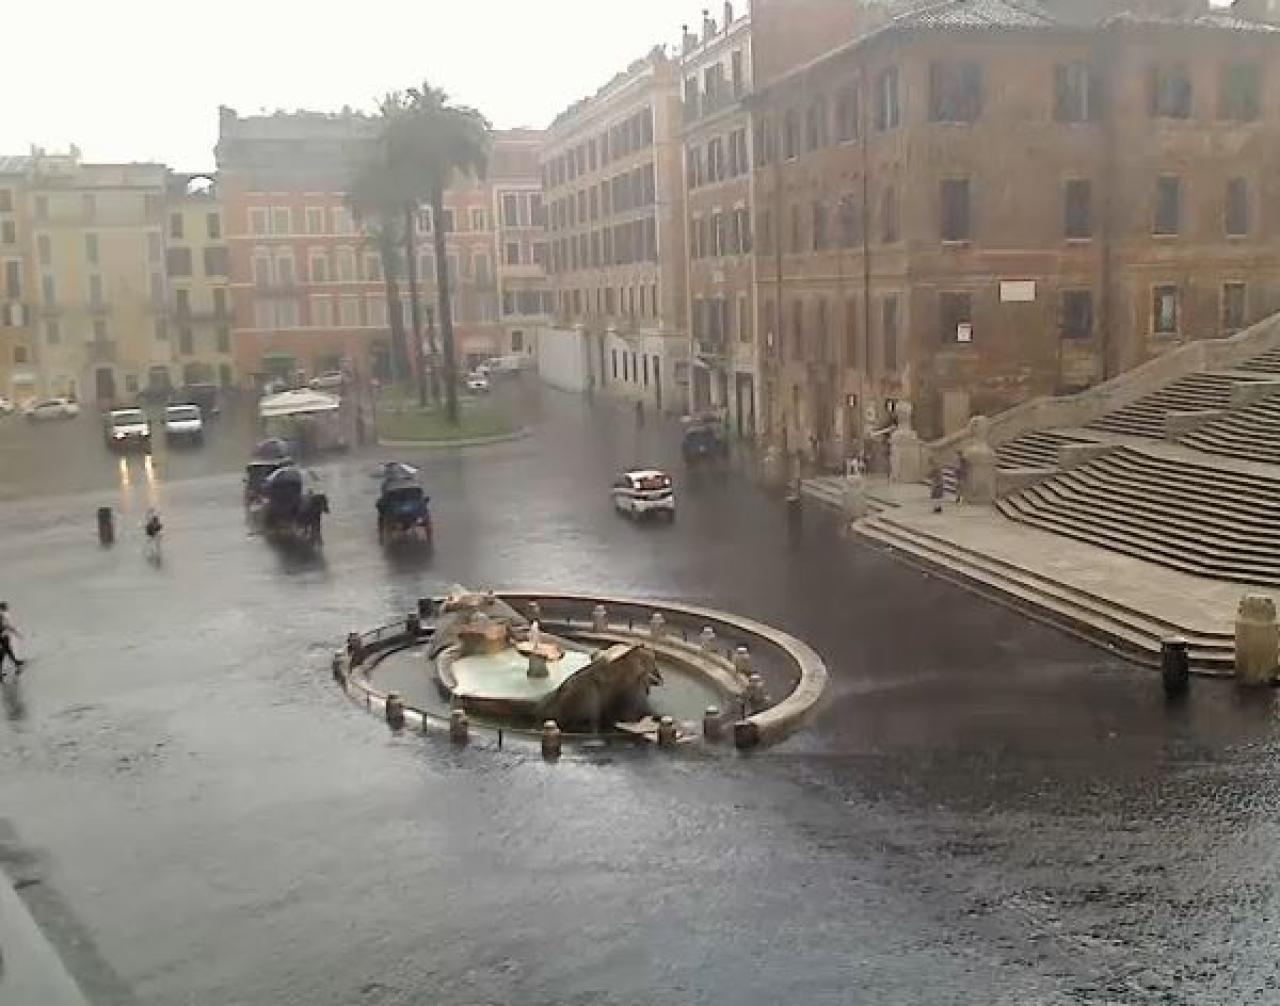 meteo rome lazio italy - photo#44